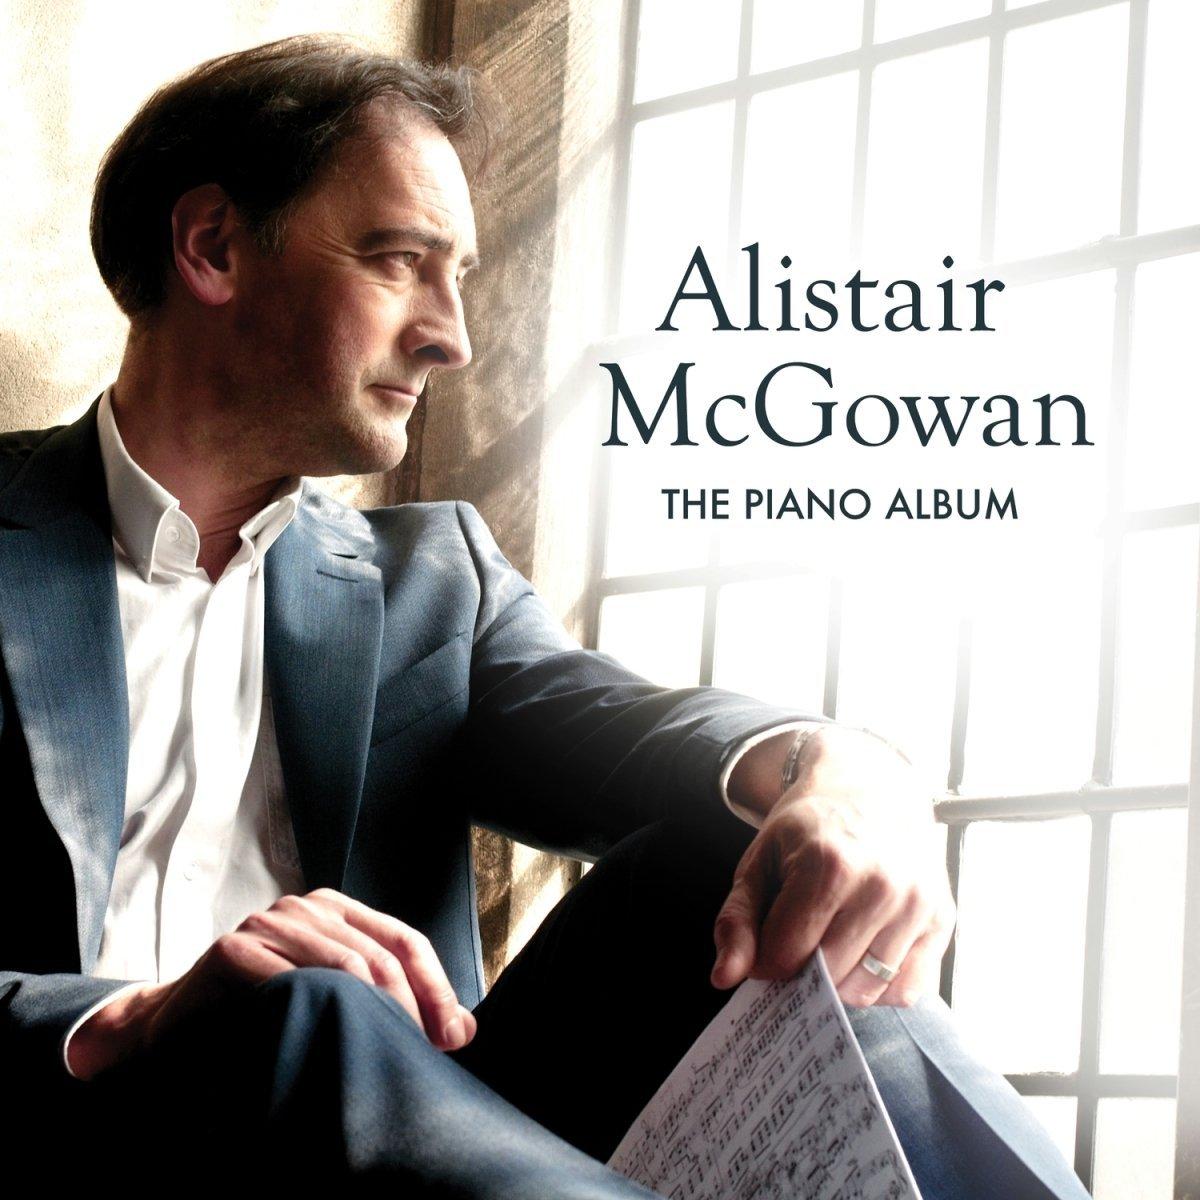 Alistair McGowan: The Piano Album